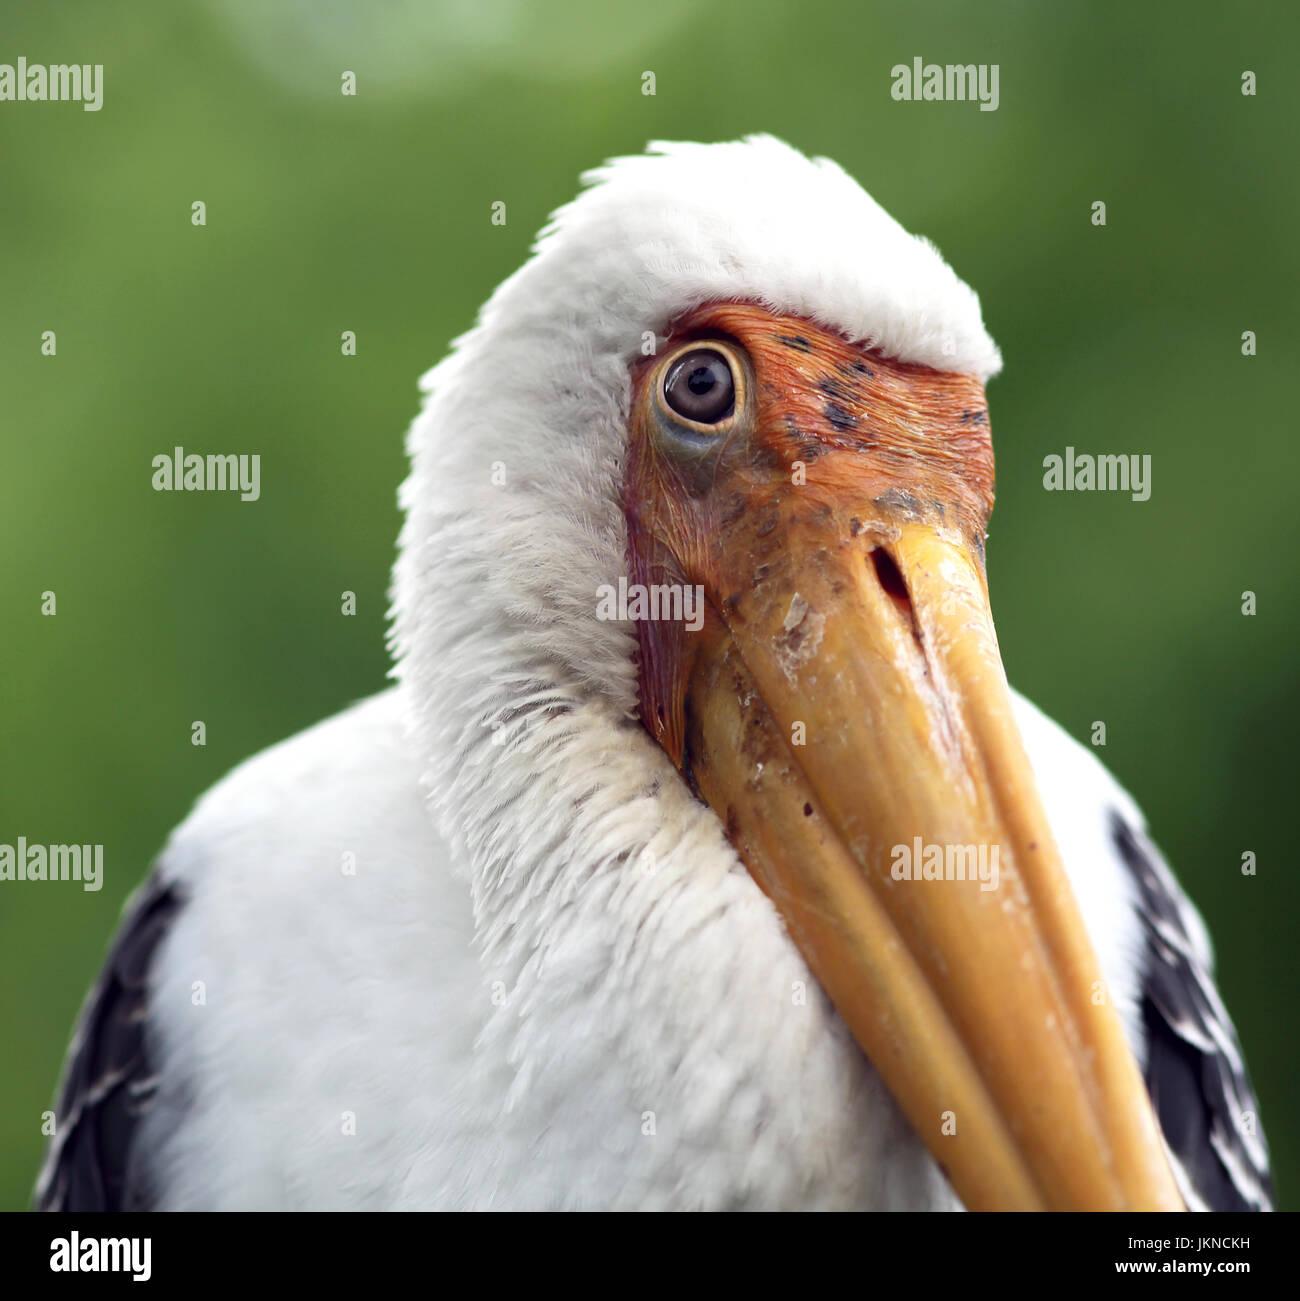 Milky stork (Mycteria cinerea) almost completely white plumaged stork species found predominantly in coastal mangroves - Stock Image